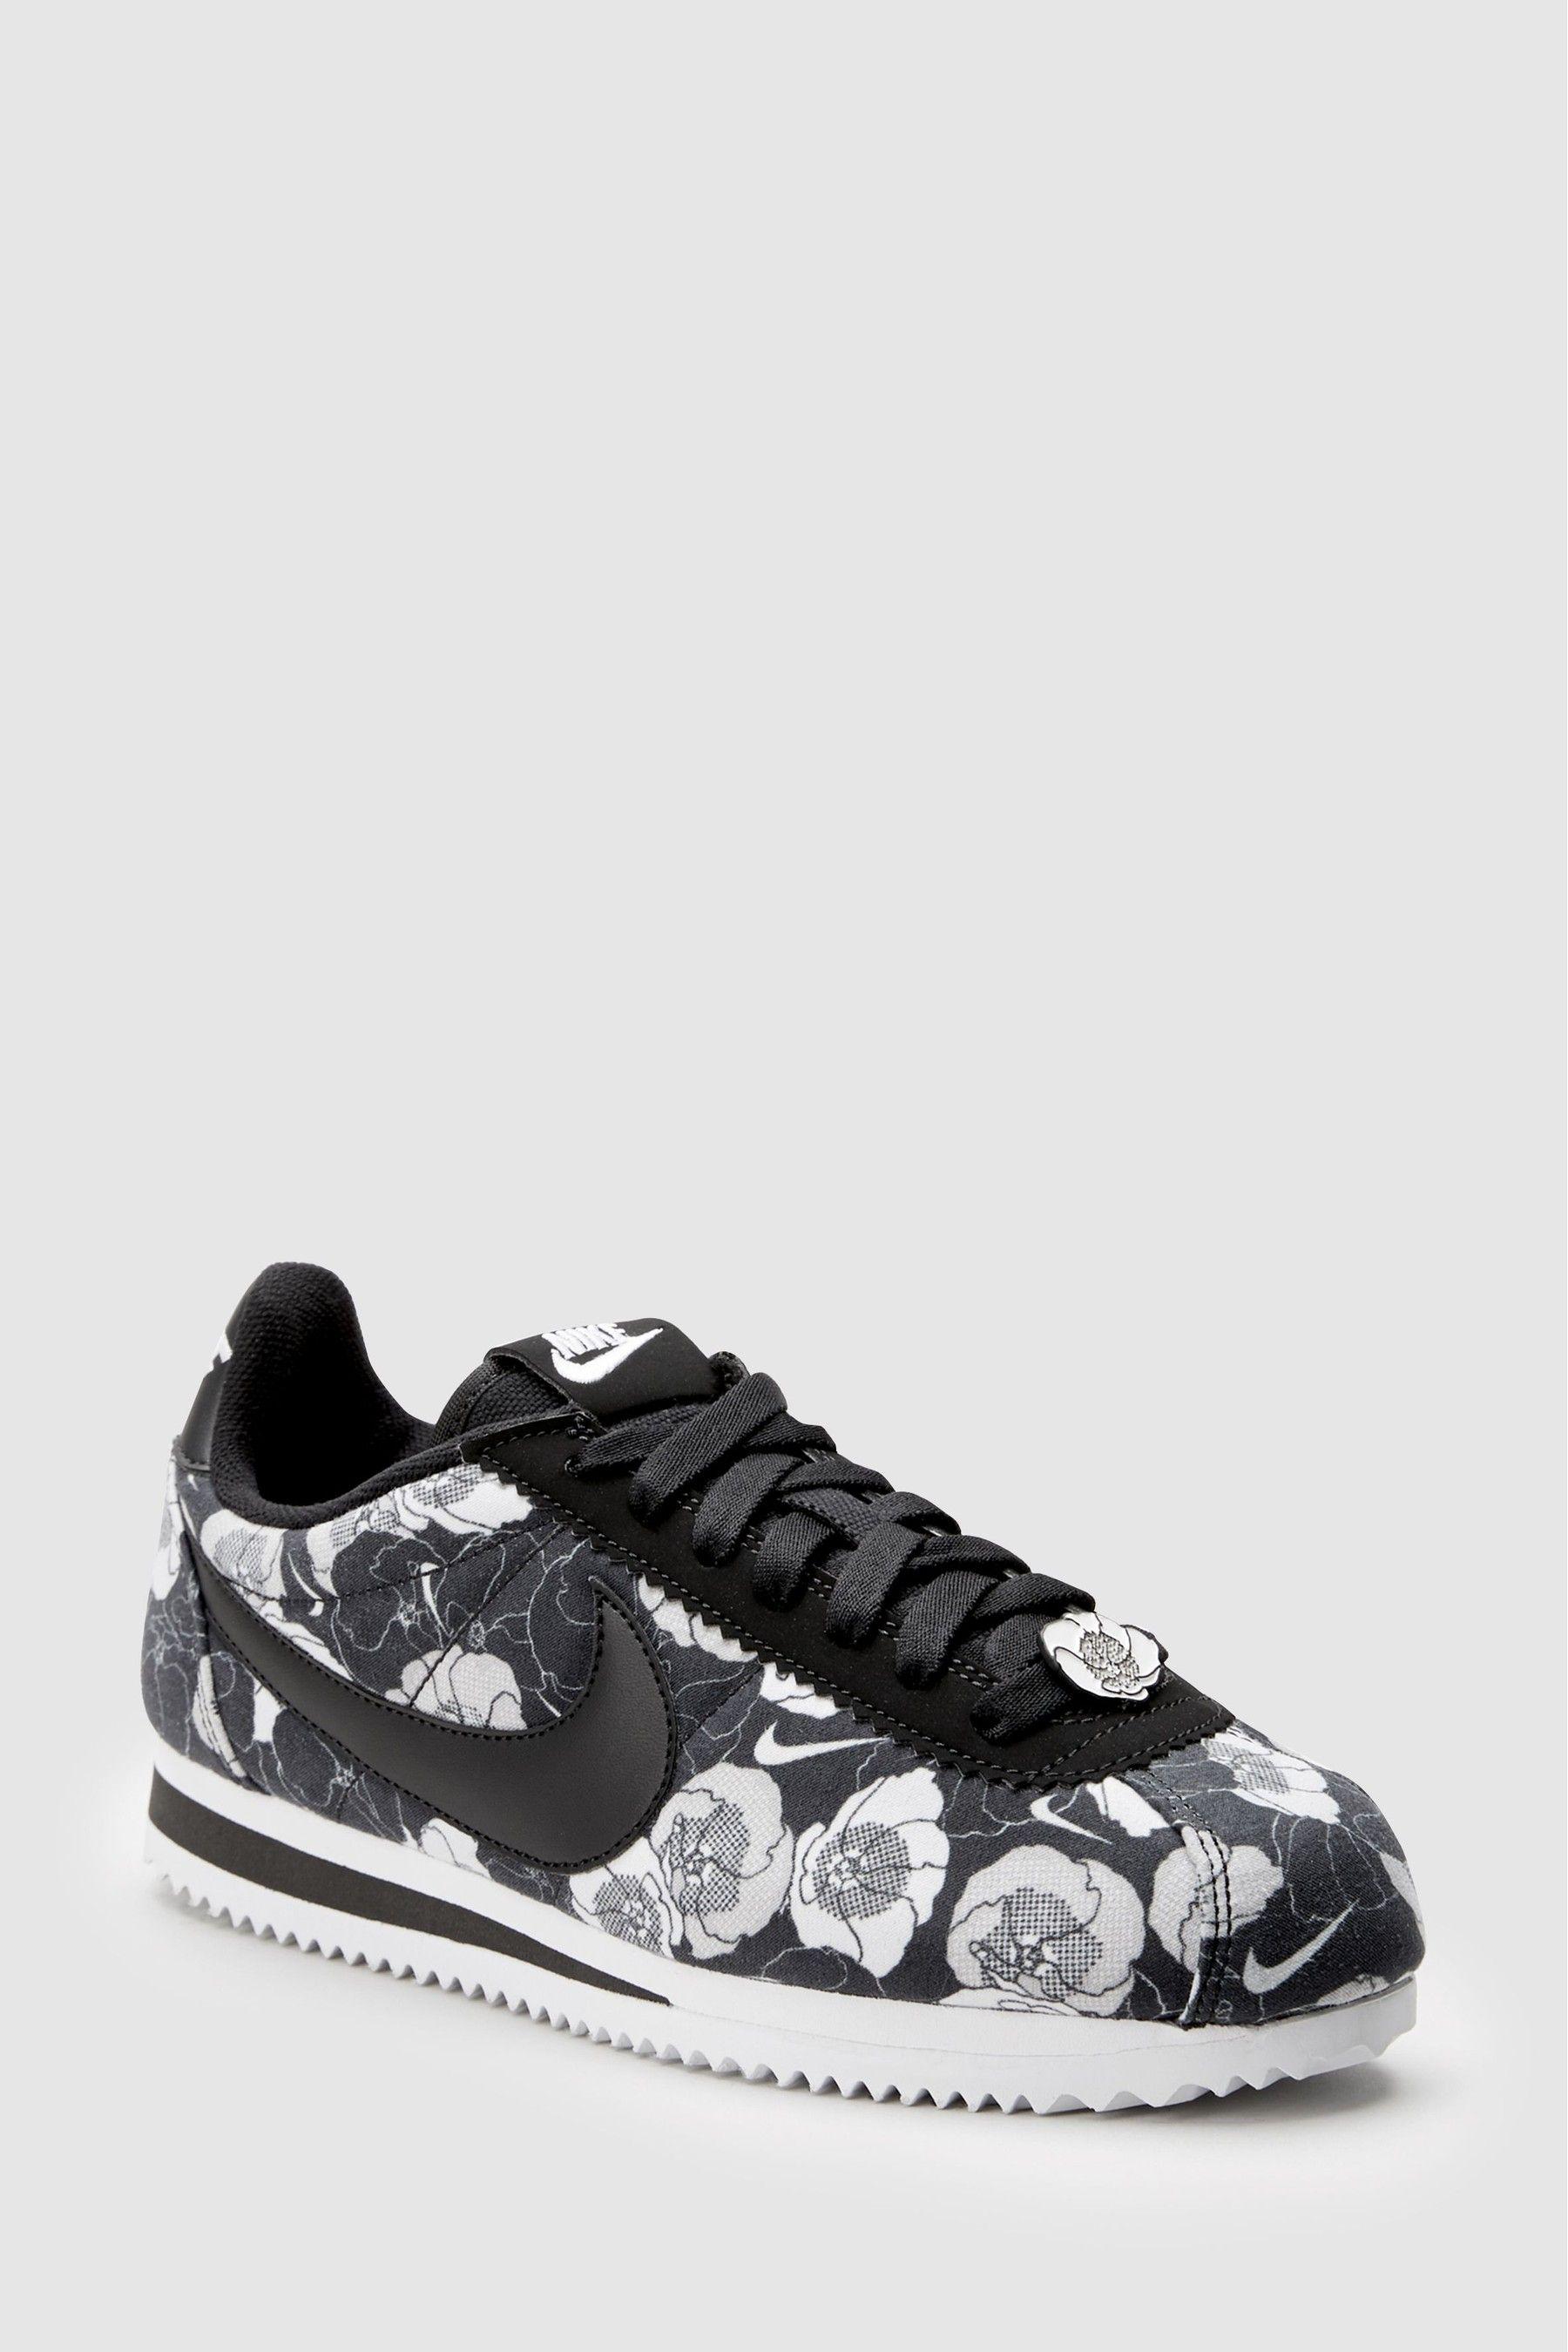 Womens Nike Floral Cortez Black | White nike shoes, Nike